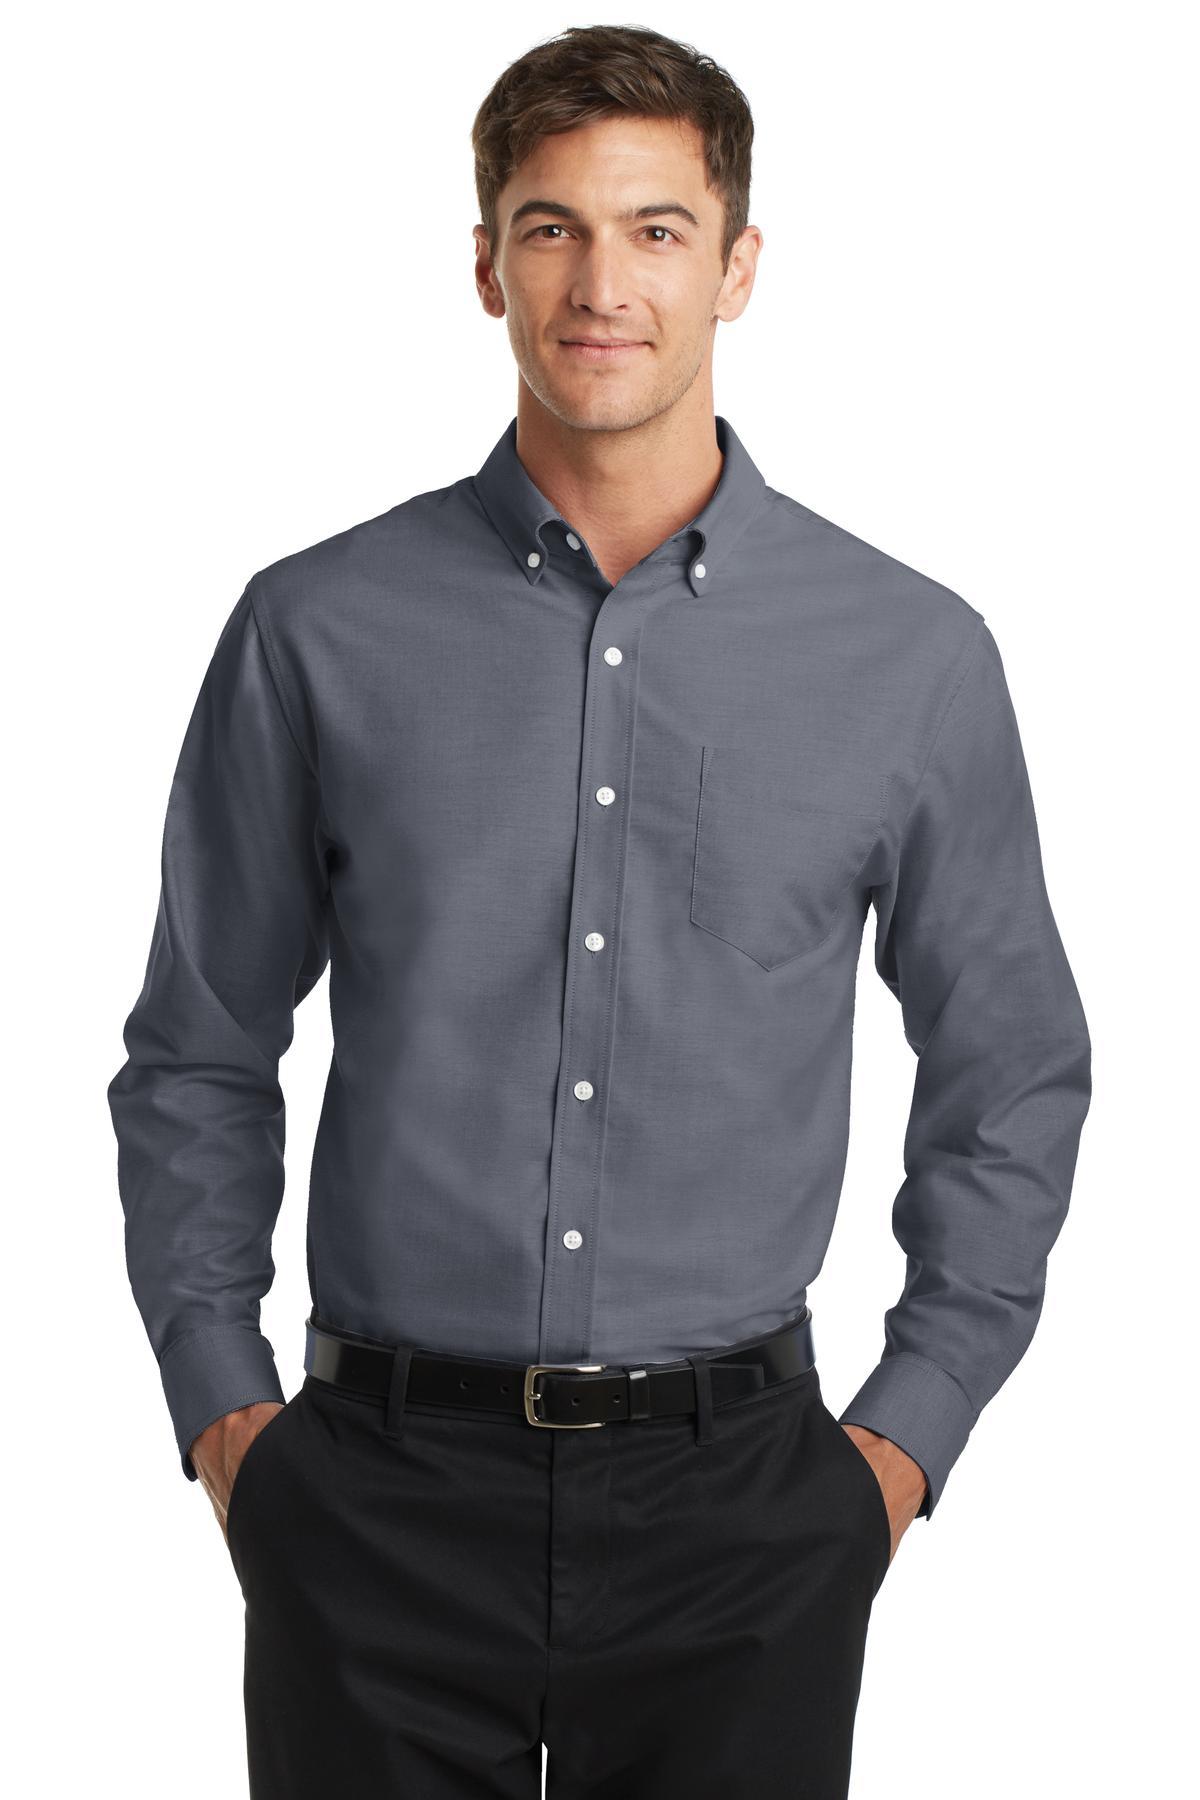 Port Authority® SuperPro Oxford Shirt.-Port Authority